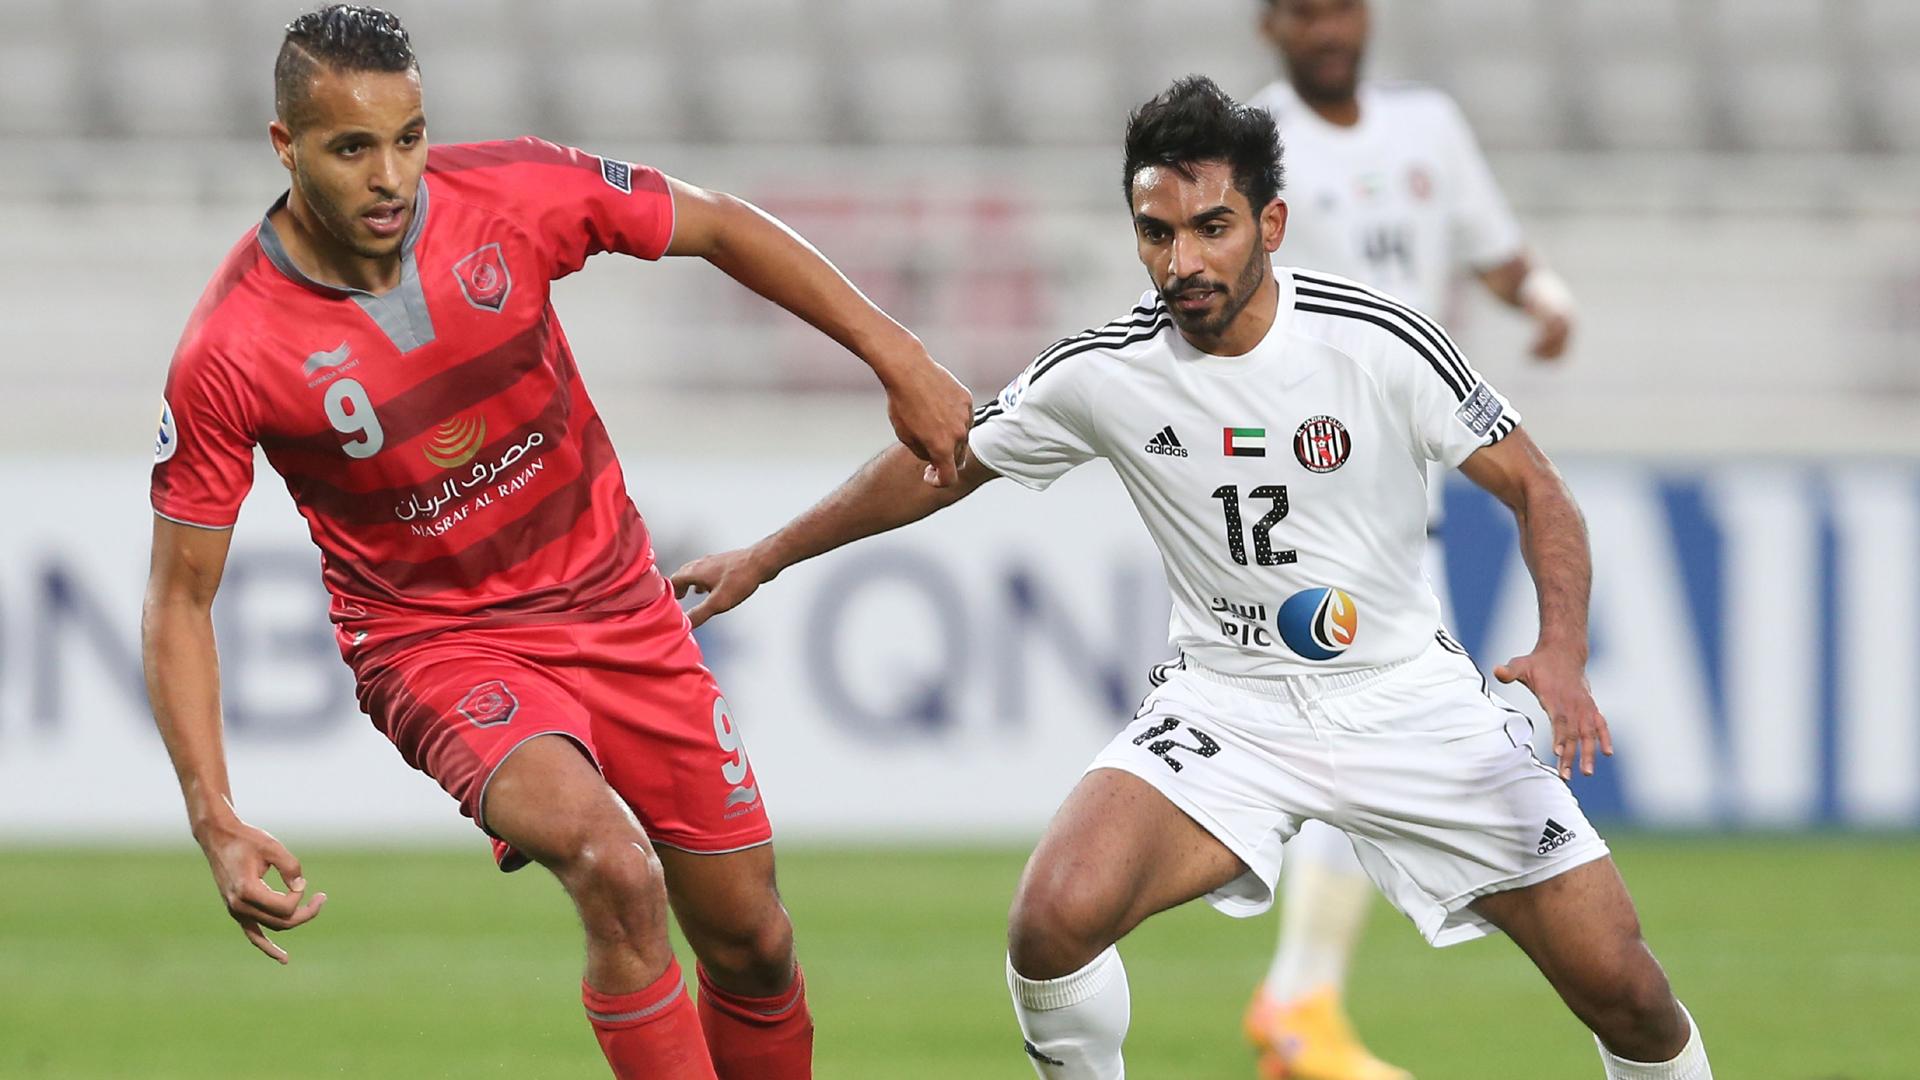 Youssef Al-Arabi Salim Rashid Lekhwiya Al-Jazira AFC Champions League 2017